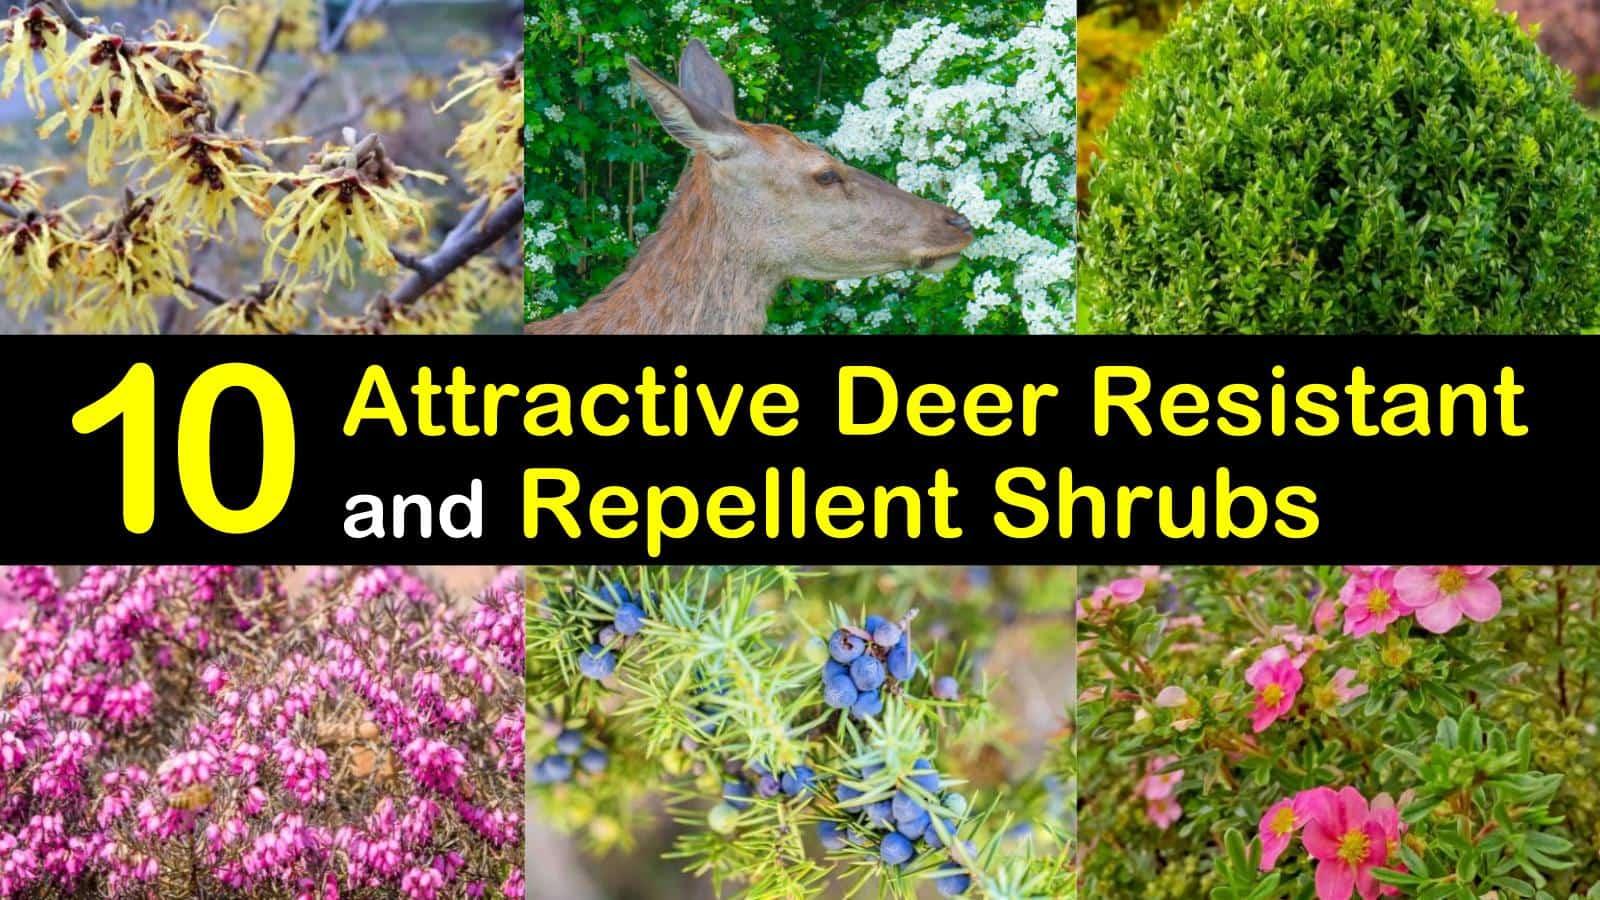 deer resistant shrubs titleimg1